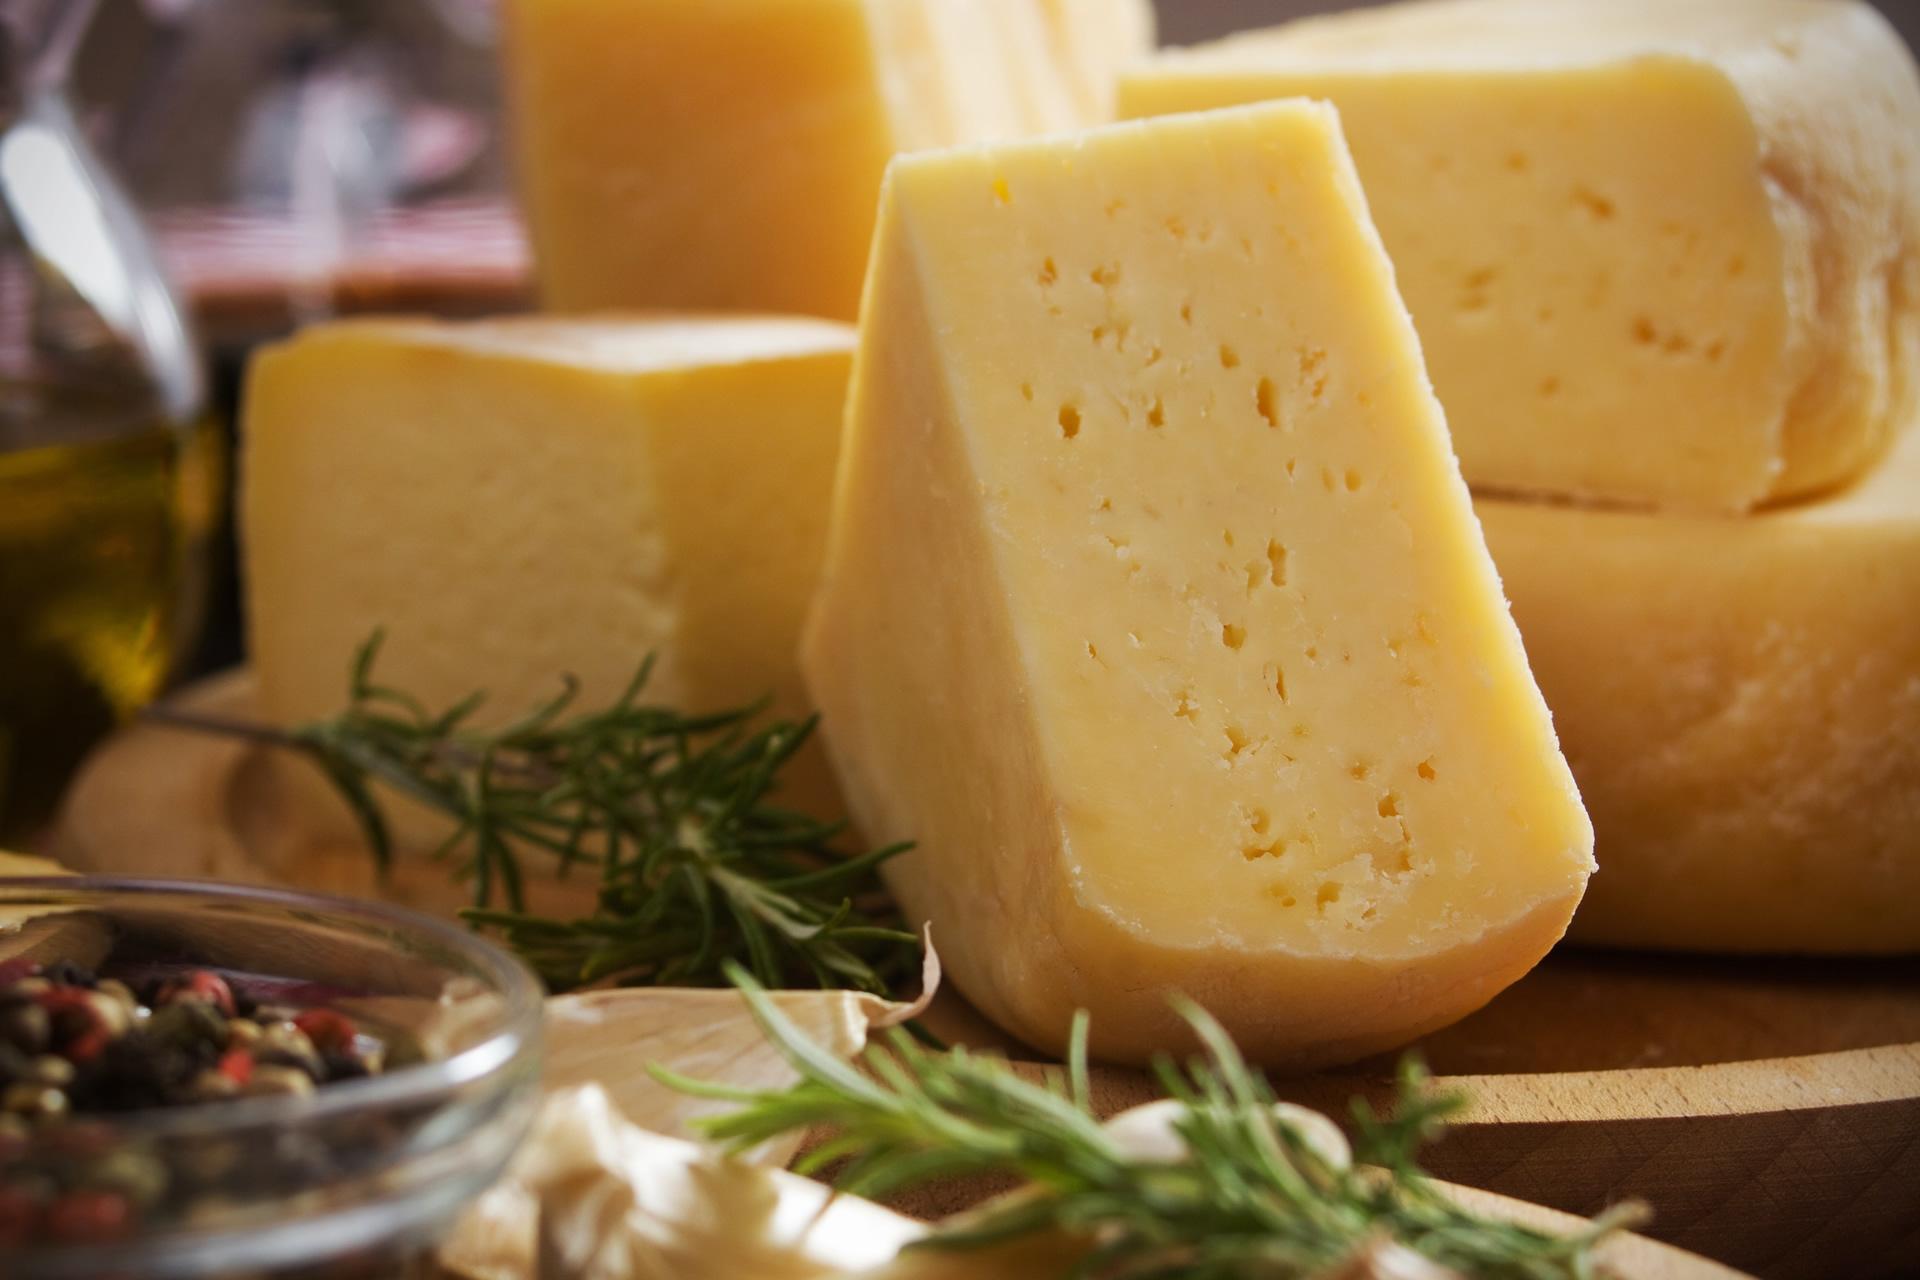 Greek cheeses beyond Feta